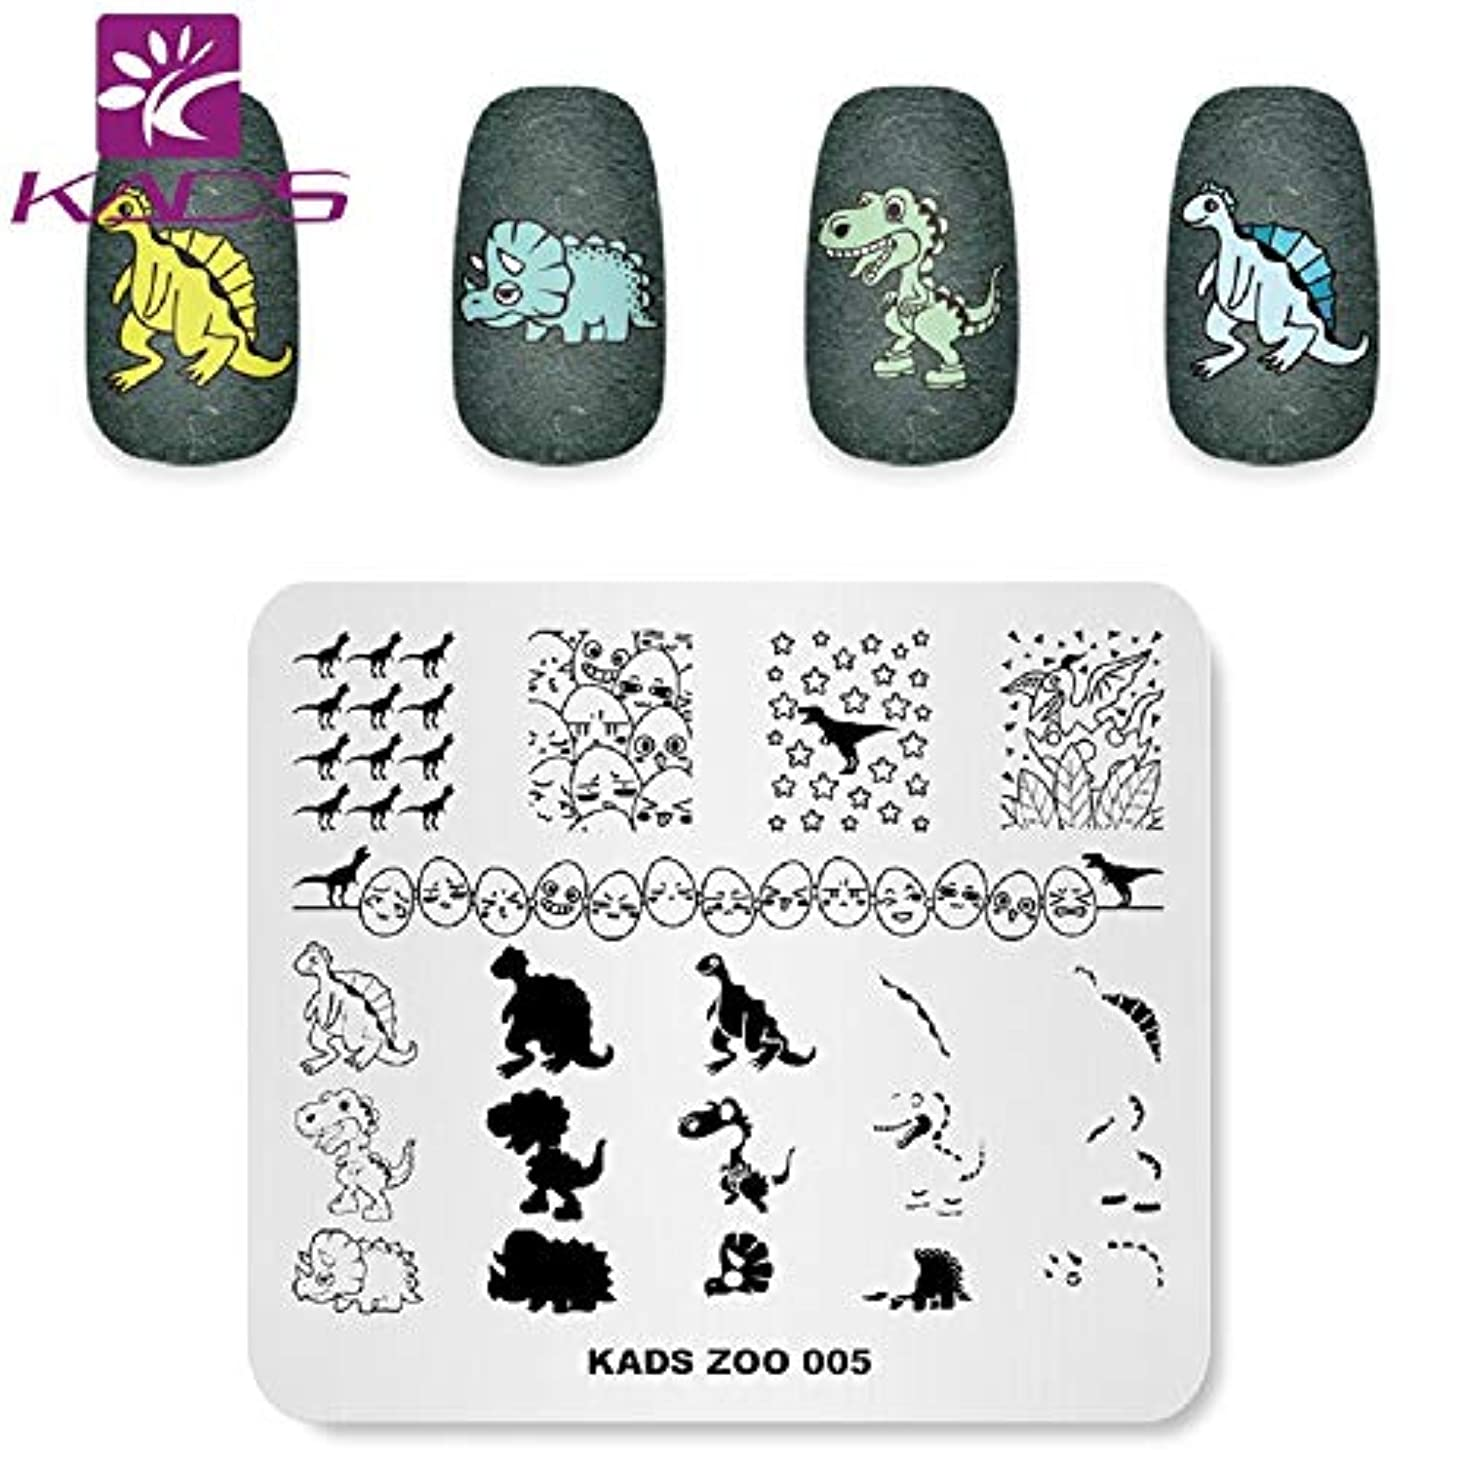 KADS ネイルスタンプ ネイルスタンピングプレート 可愛い小恐竜 ネイルステンシル ネイルアート道具 (ZO005)